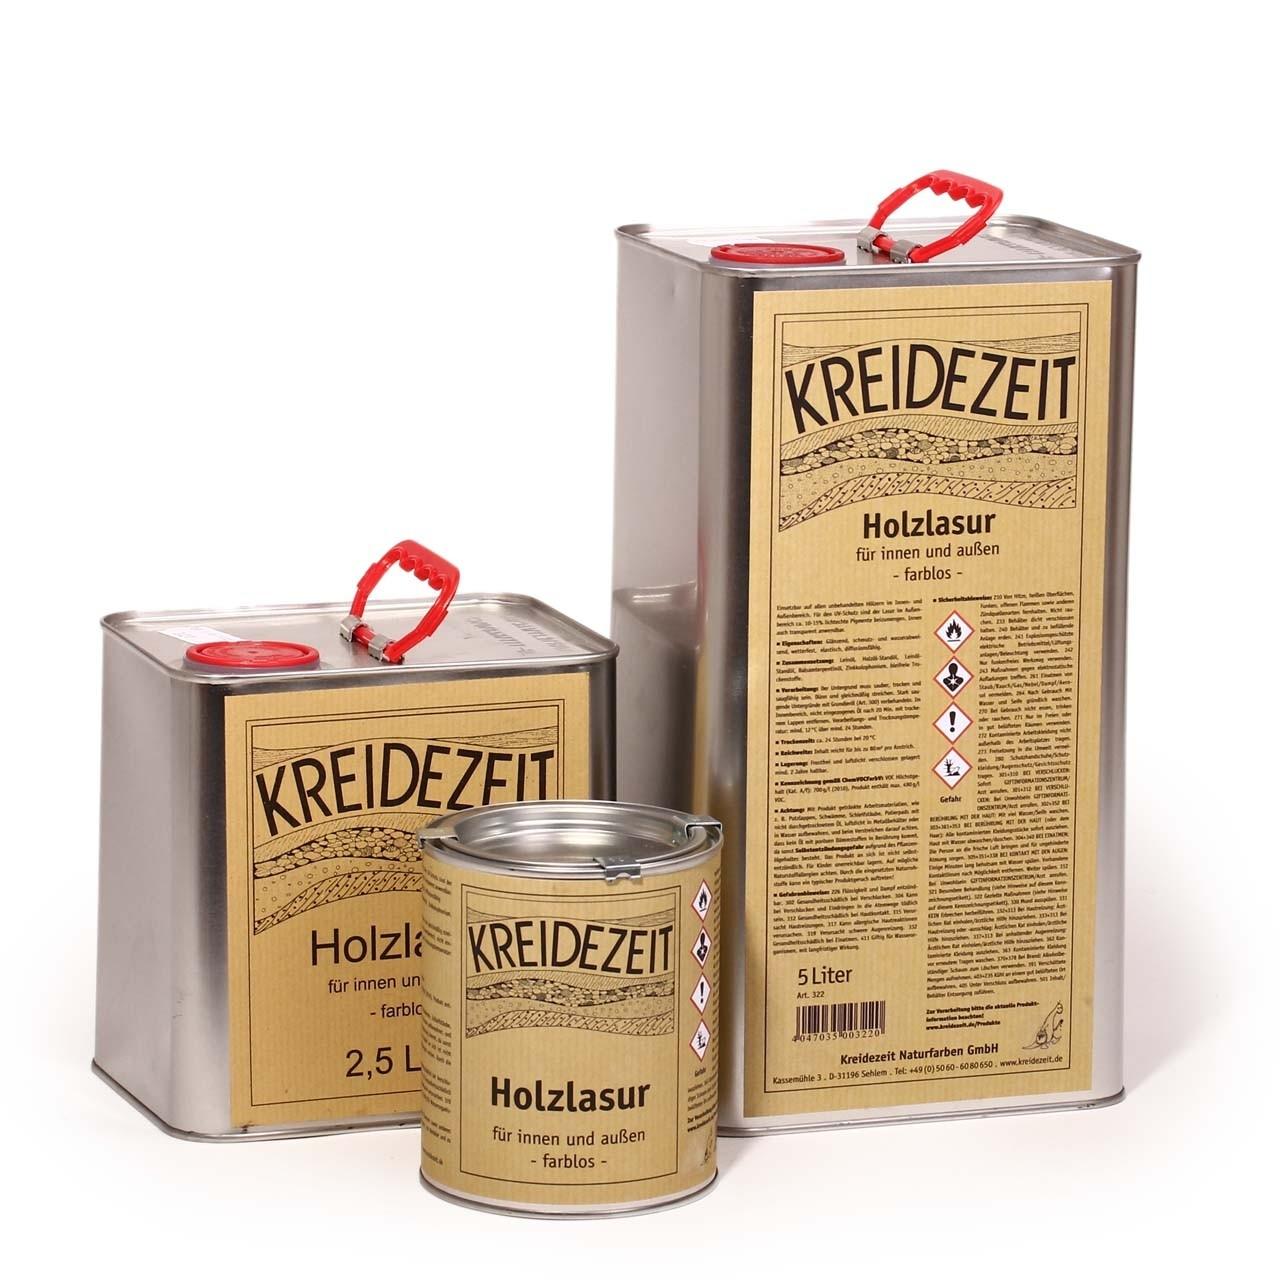 Kreidezeit Holzlasur farblos 20 L